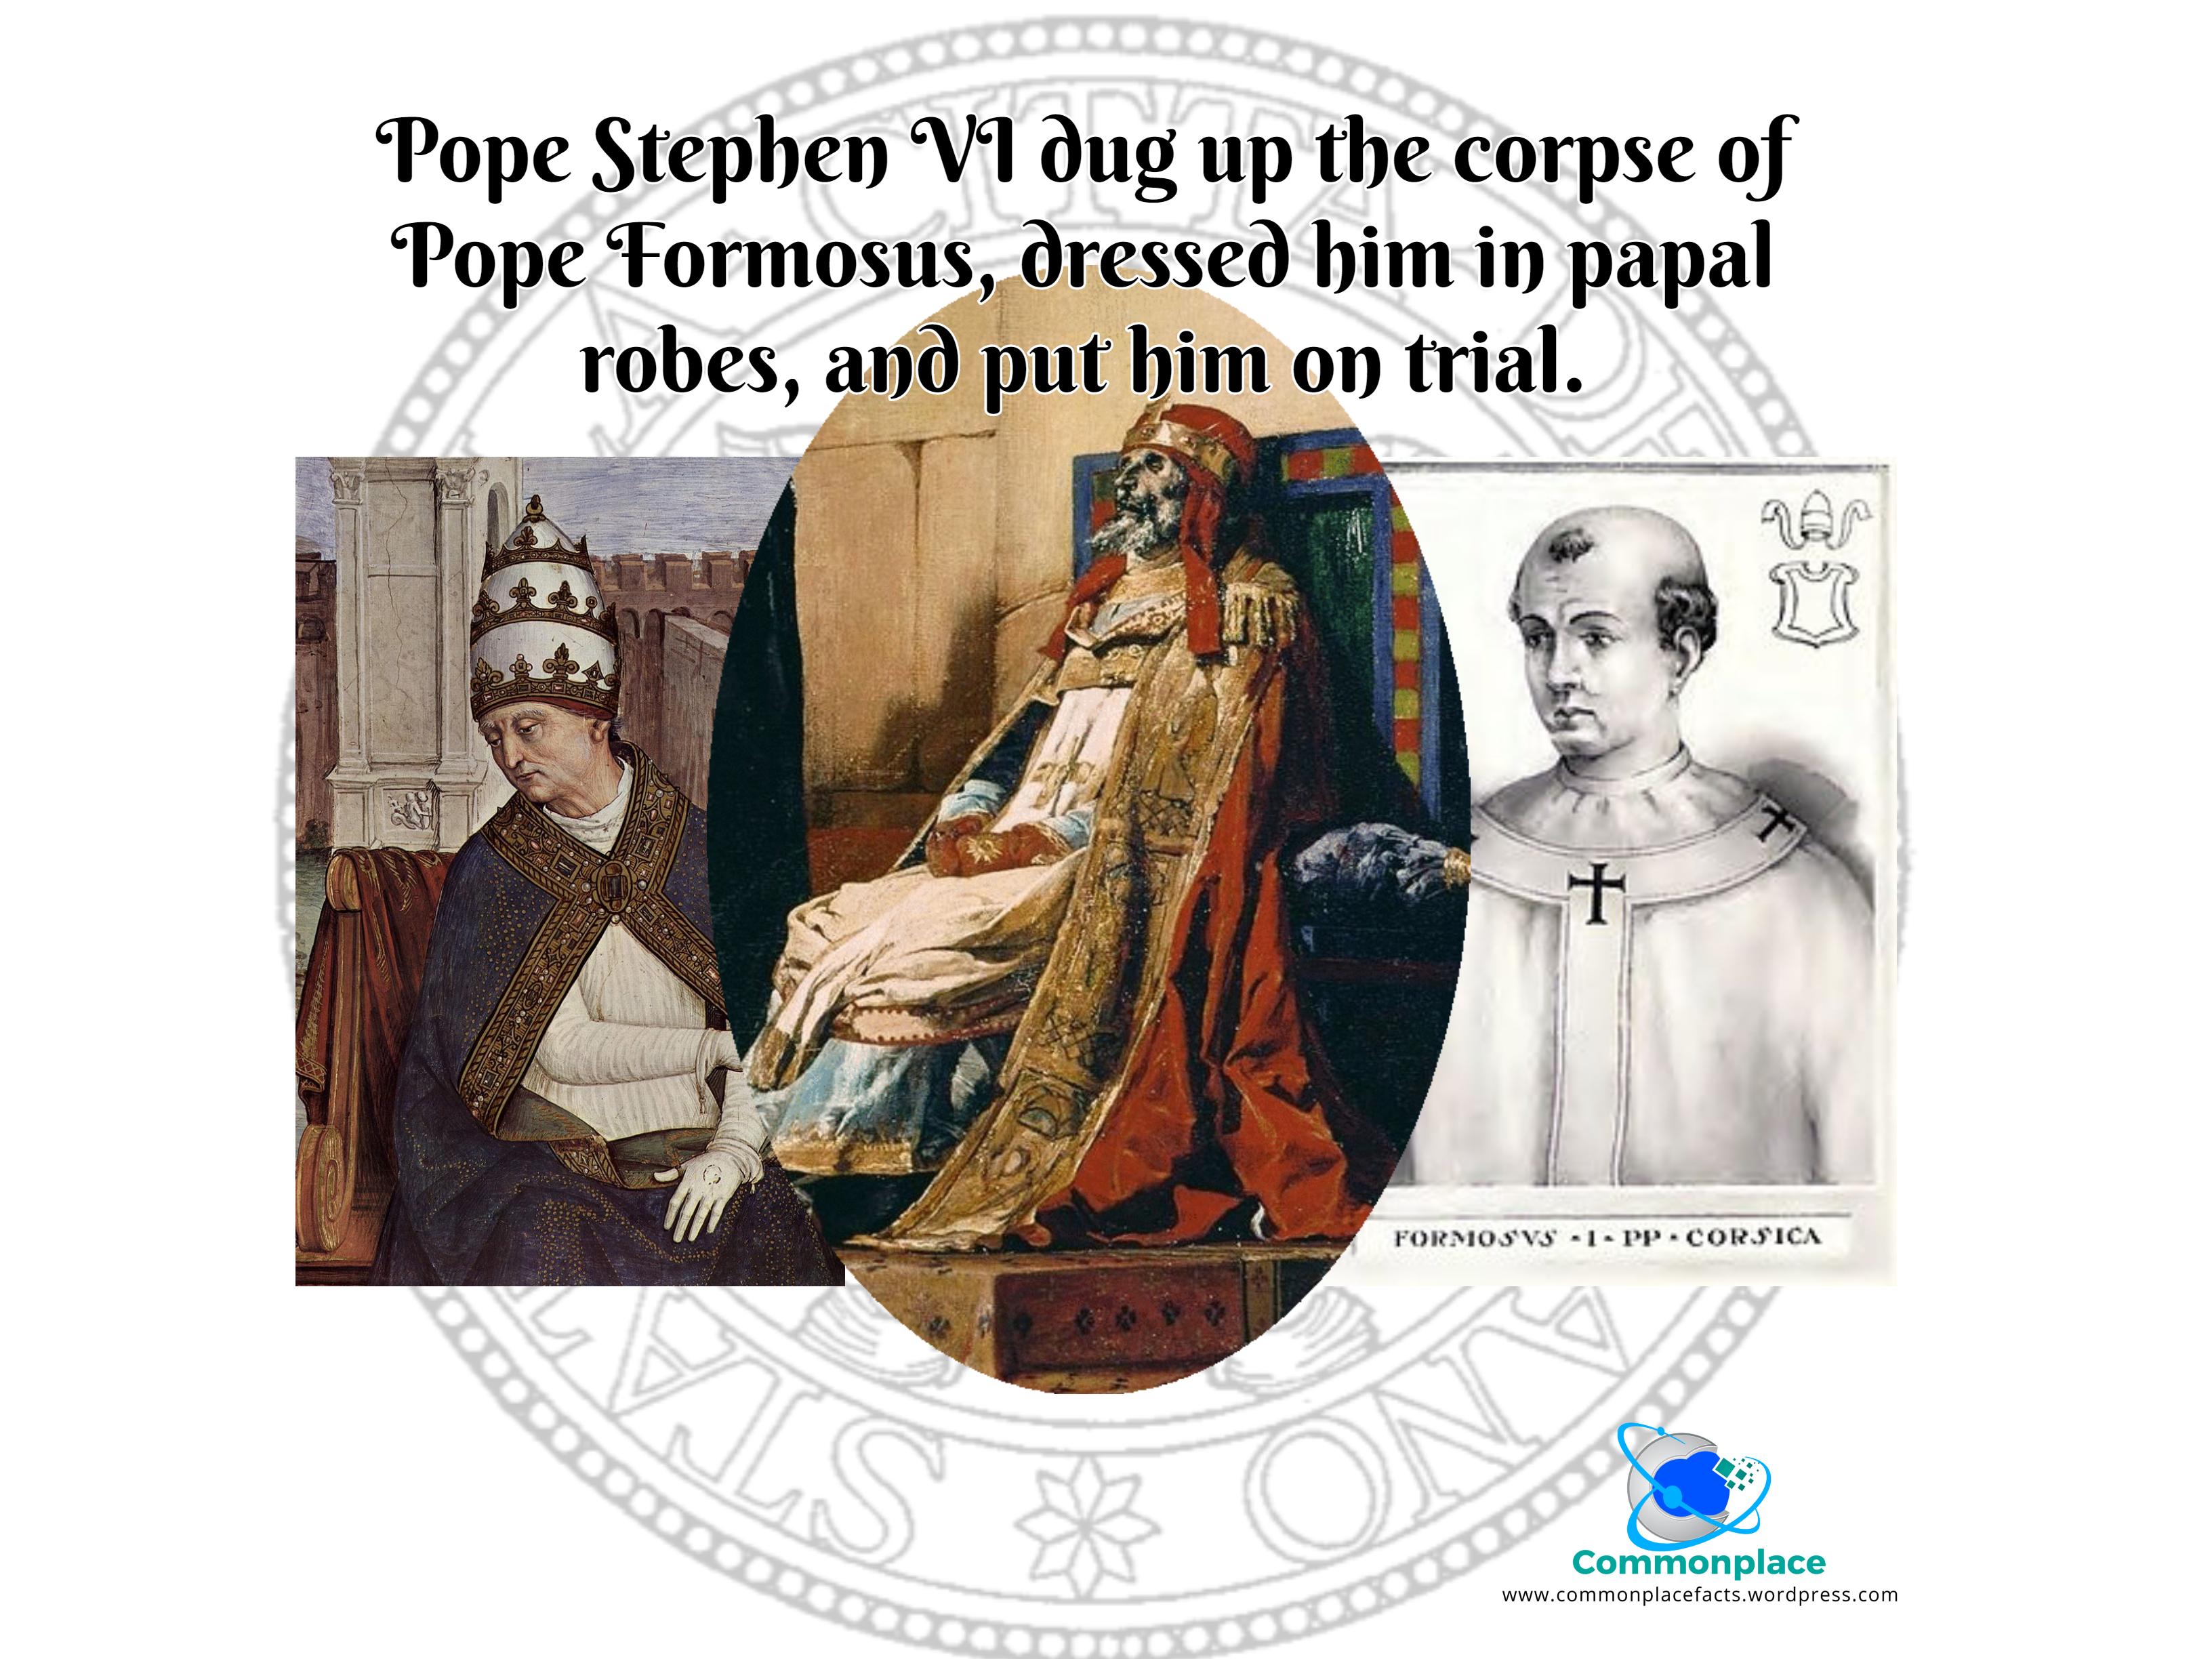 #CadaverSyndod #Vatican #Popes #Papacy